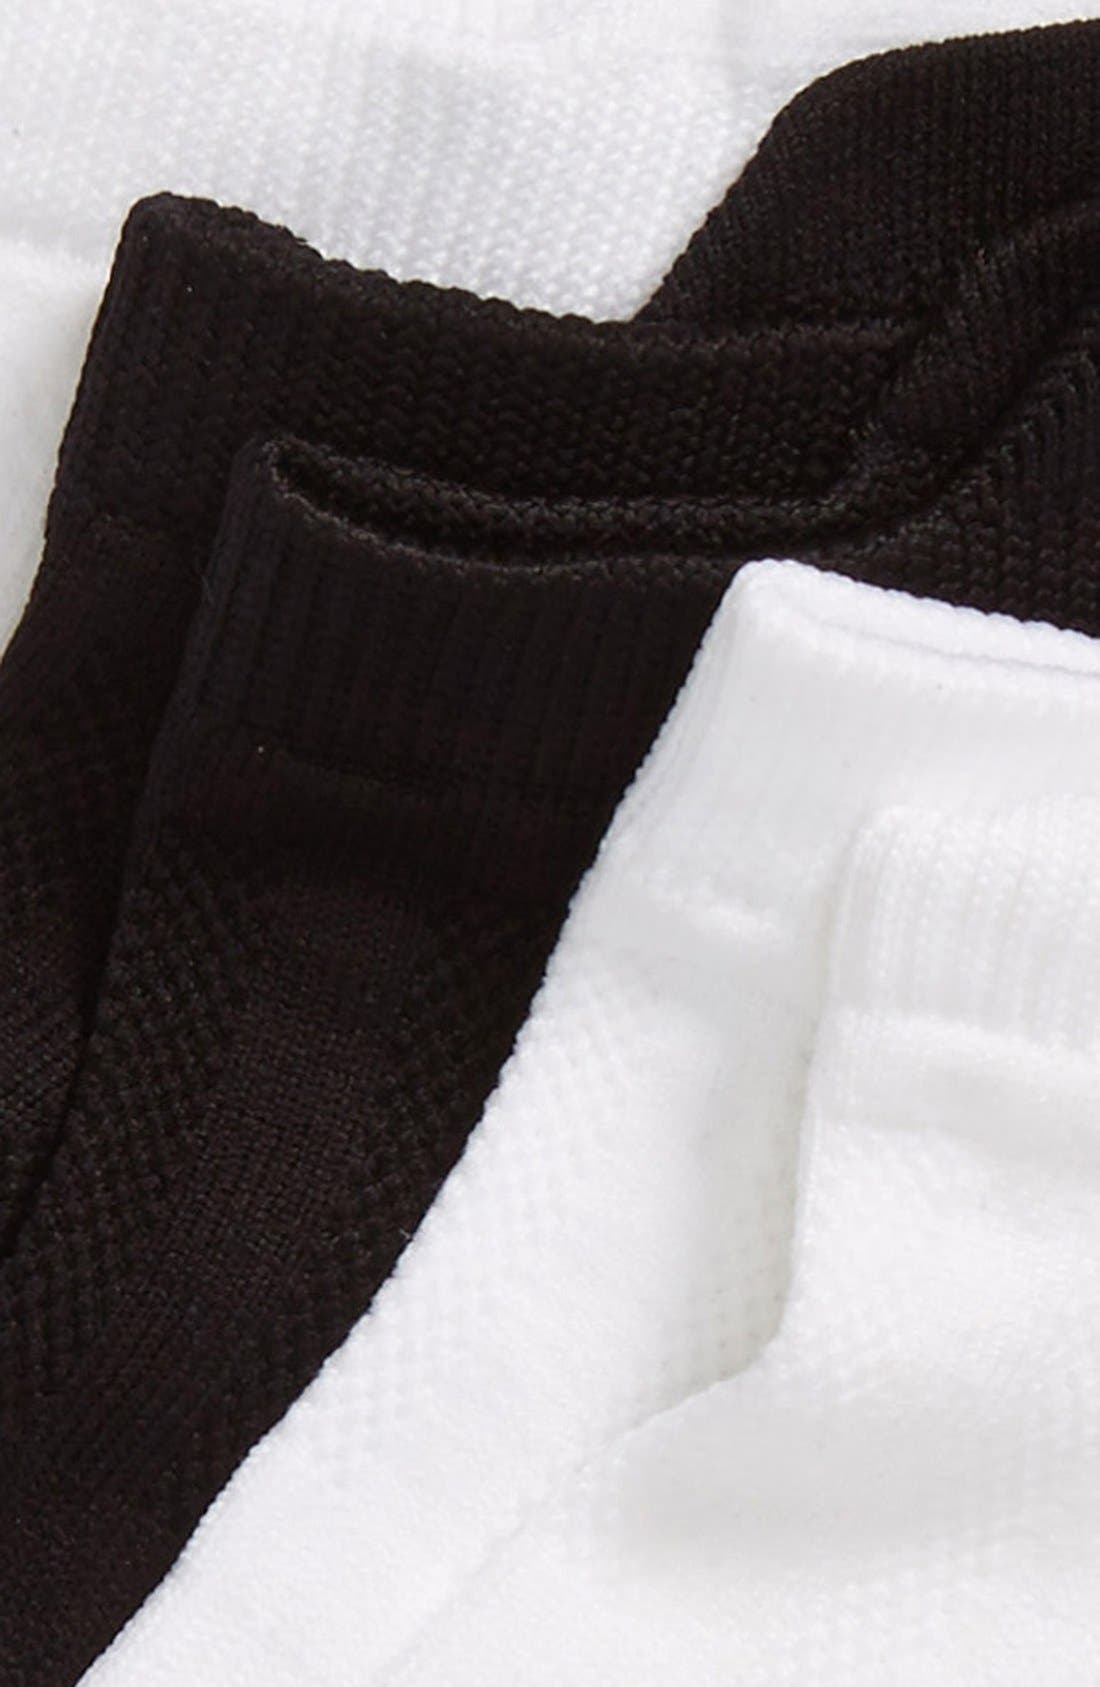 3-Pack Microfiber Tab Performance Socks,                             Alternate thumbnail 6, color,